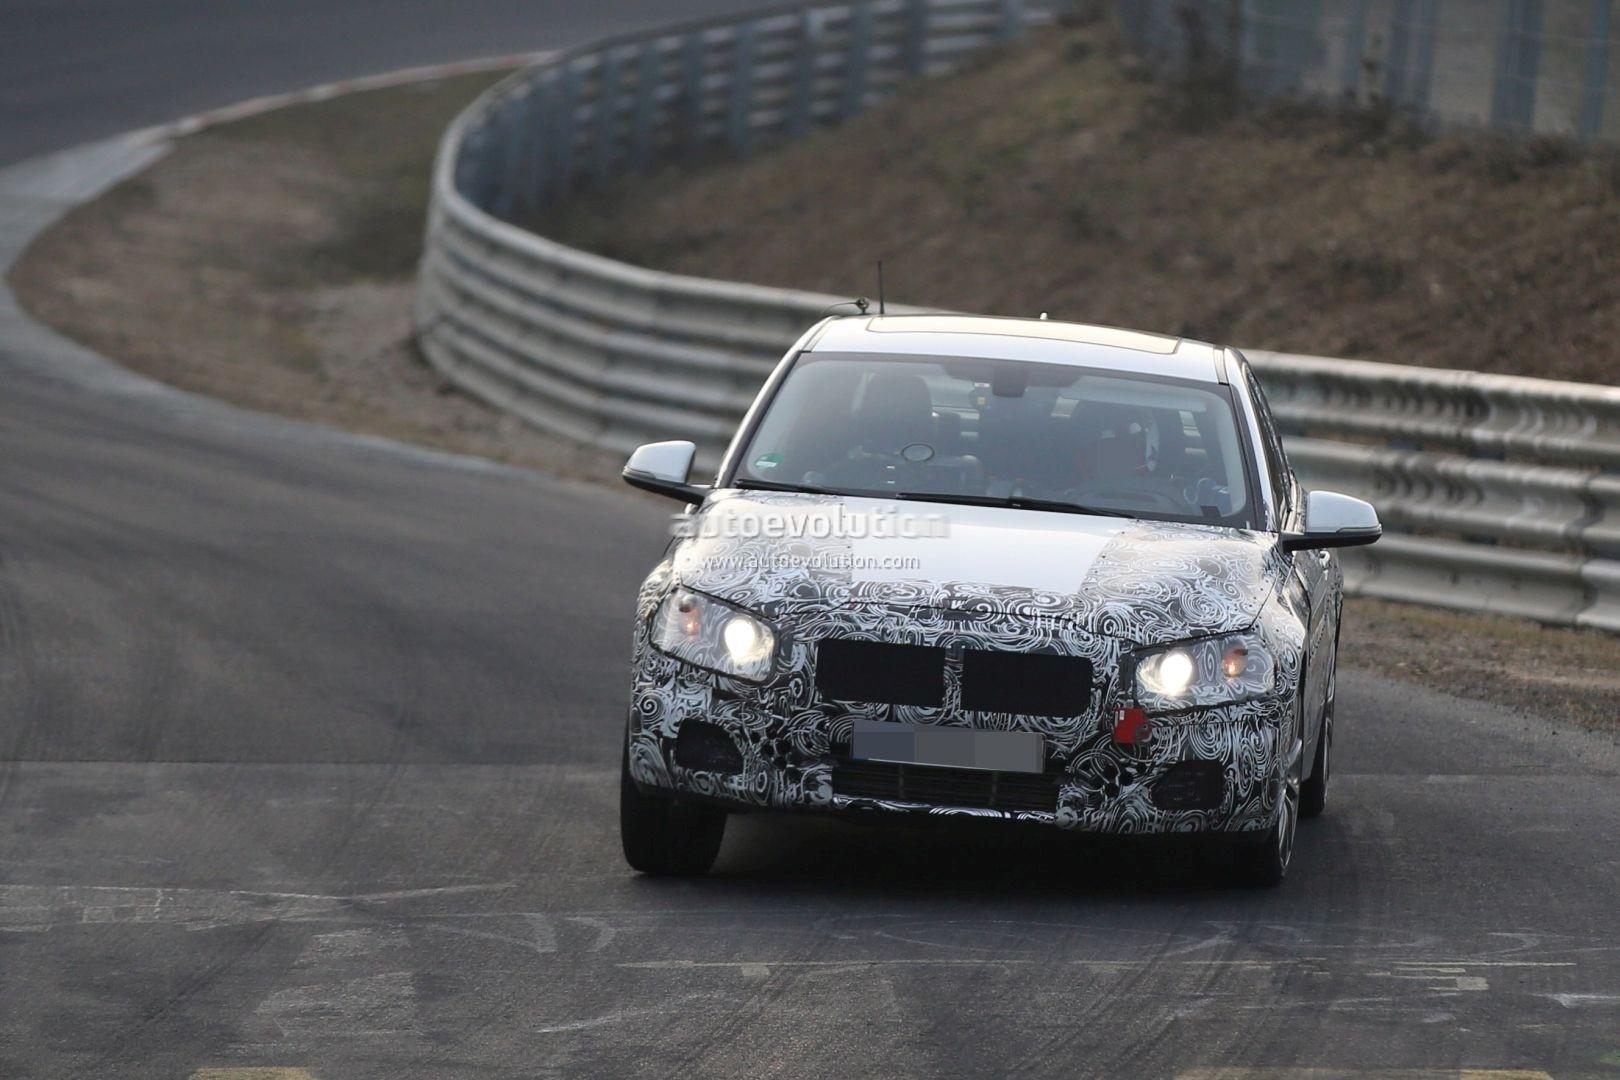 2016 - [BMW] Série 1 Sedan [F52] - Page 4 2016-bmw-f52-1-series-sedan-spotted-testing-fwd-platform-on-nurburgring-photo-gallery_8